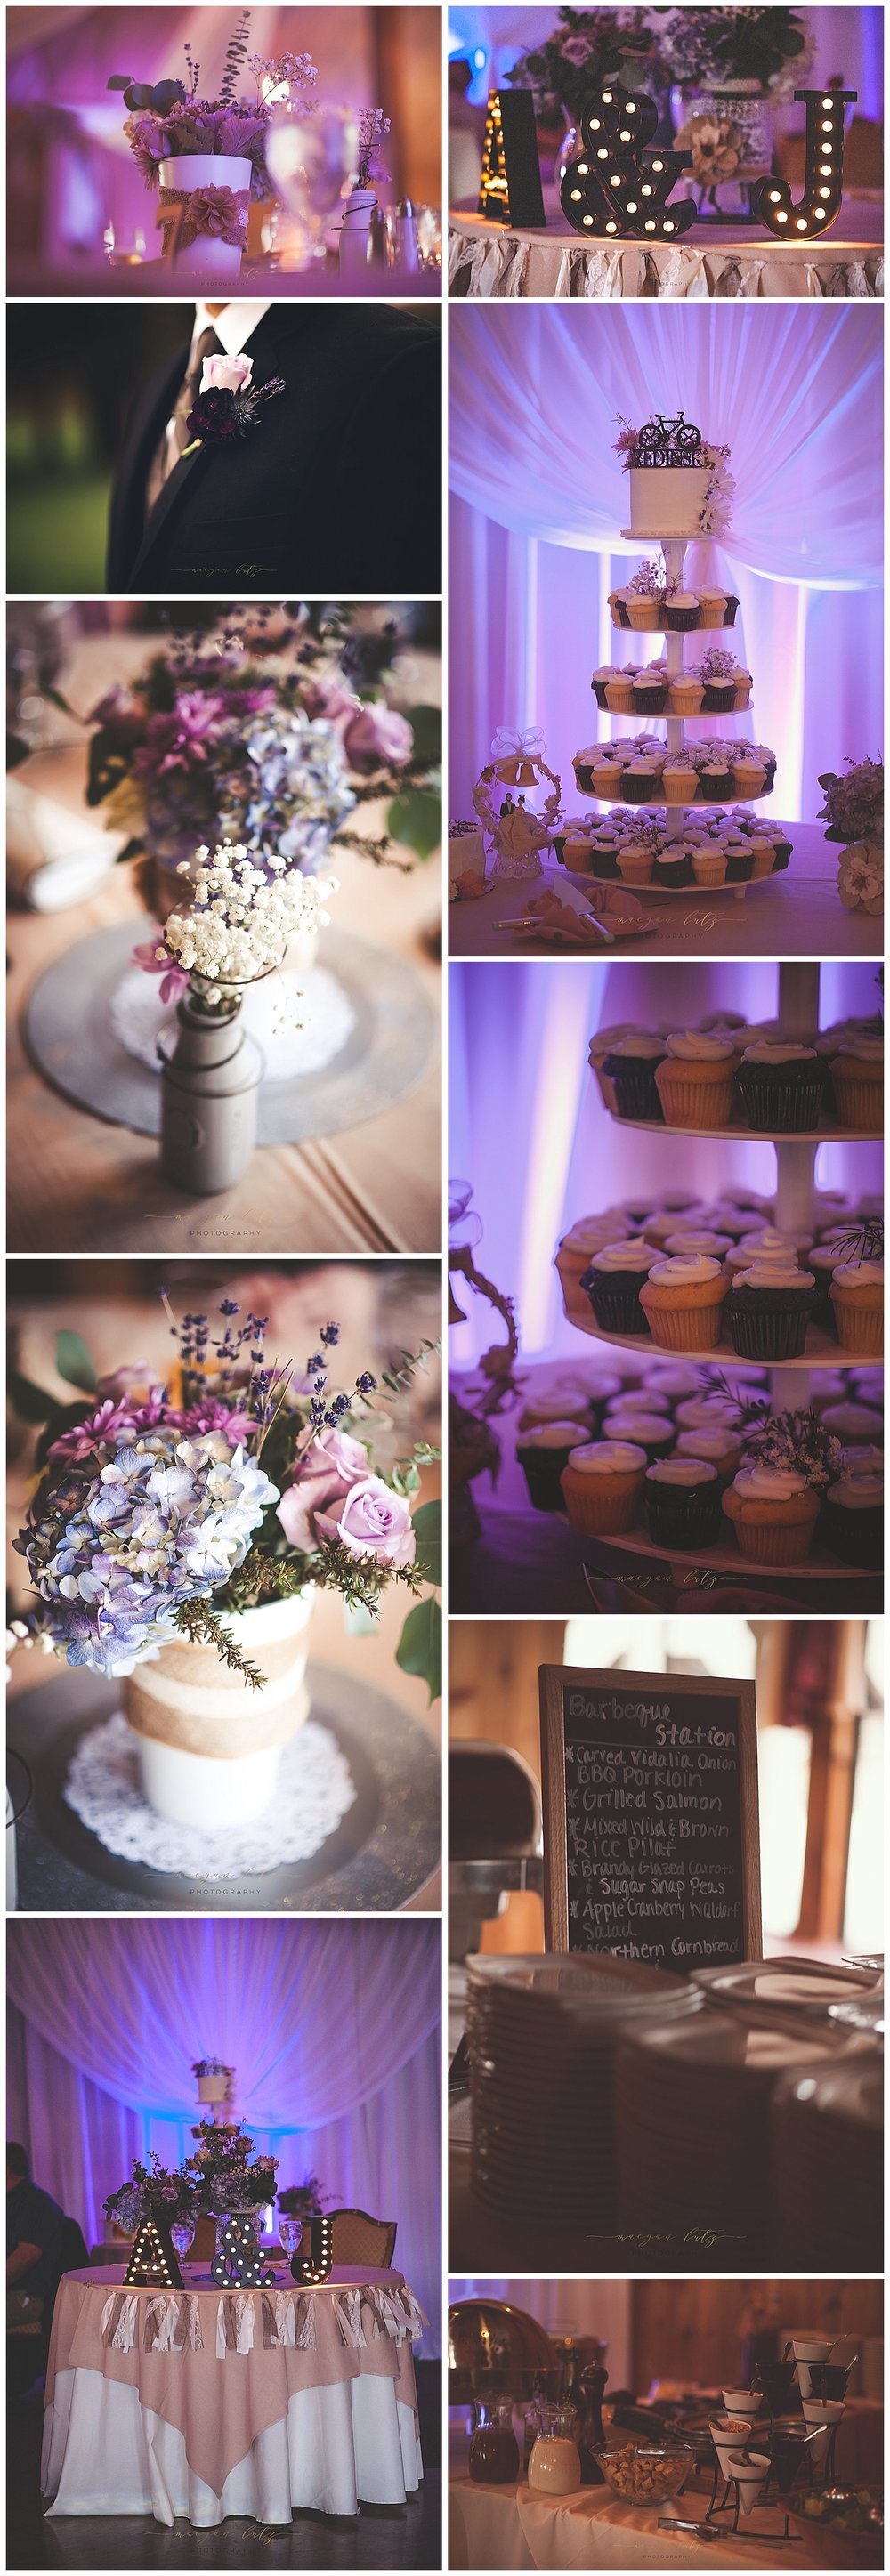 Apple-Tree-Terrace-Wedding-Photographer-in-LeHigh-Valley-NEPA_0036.jpg